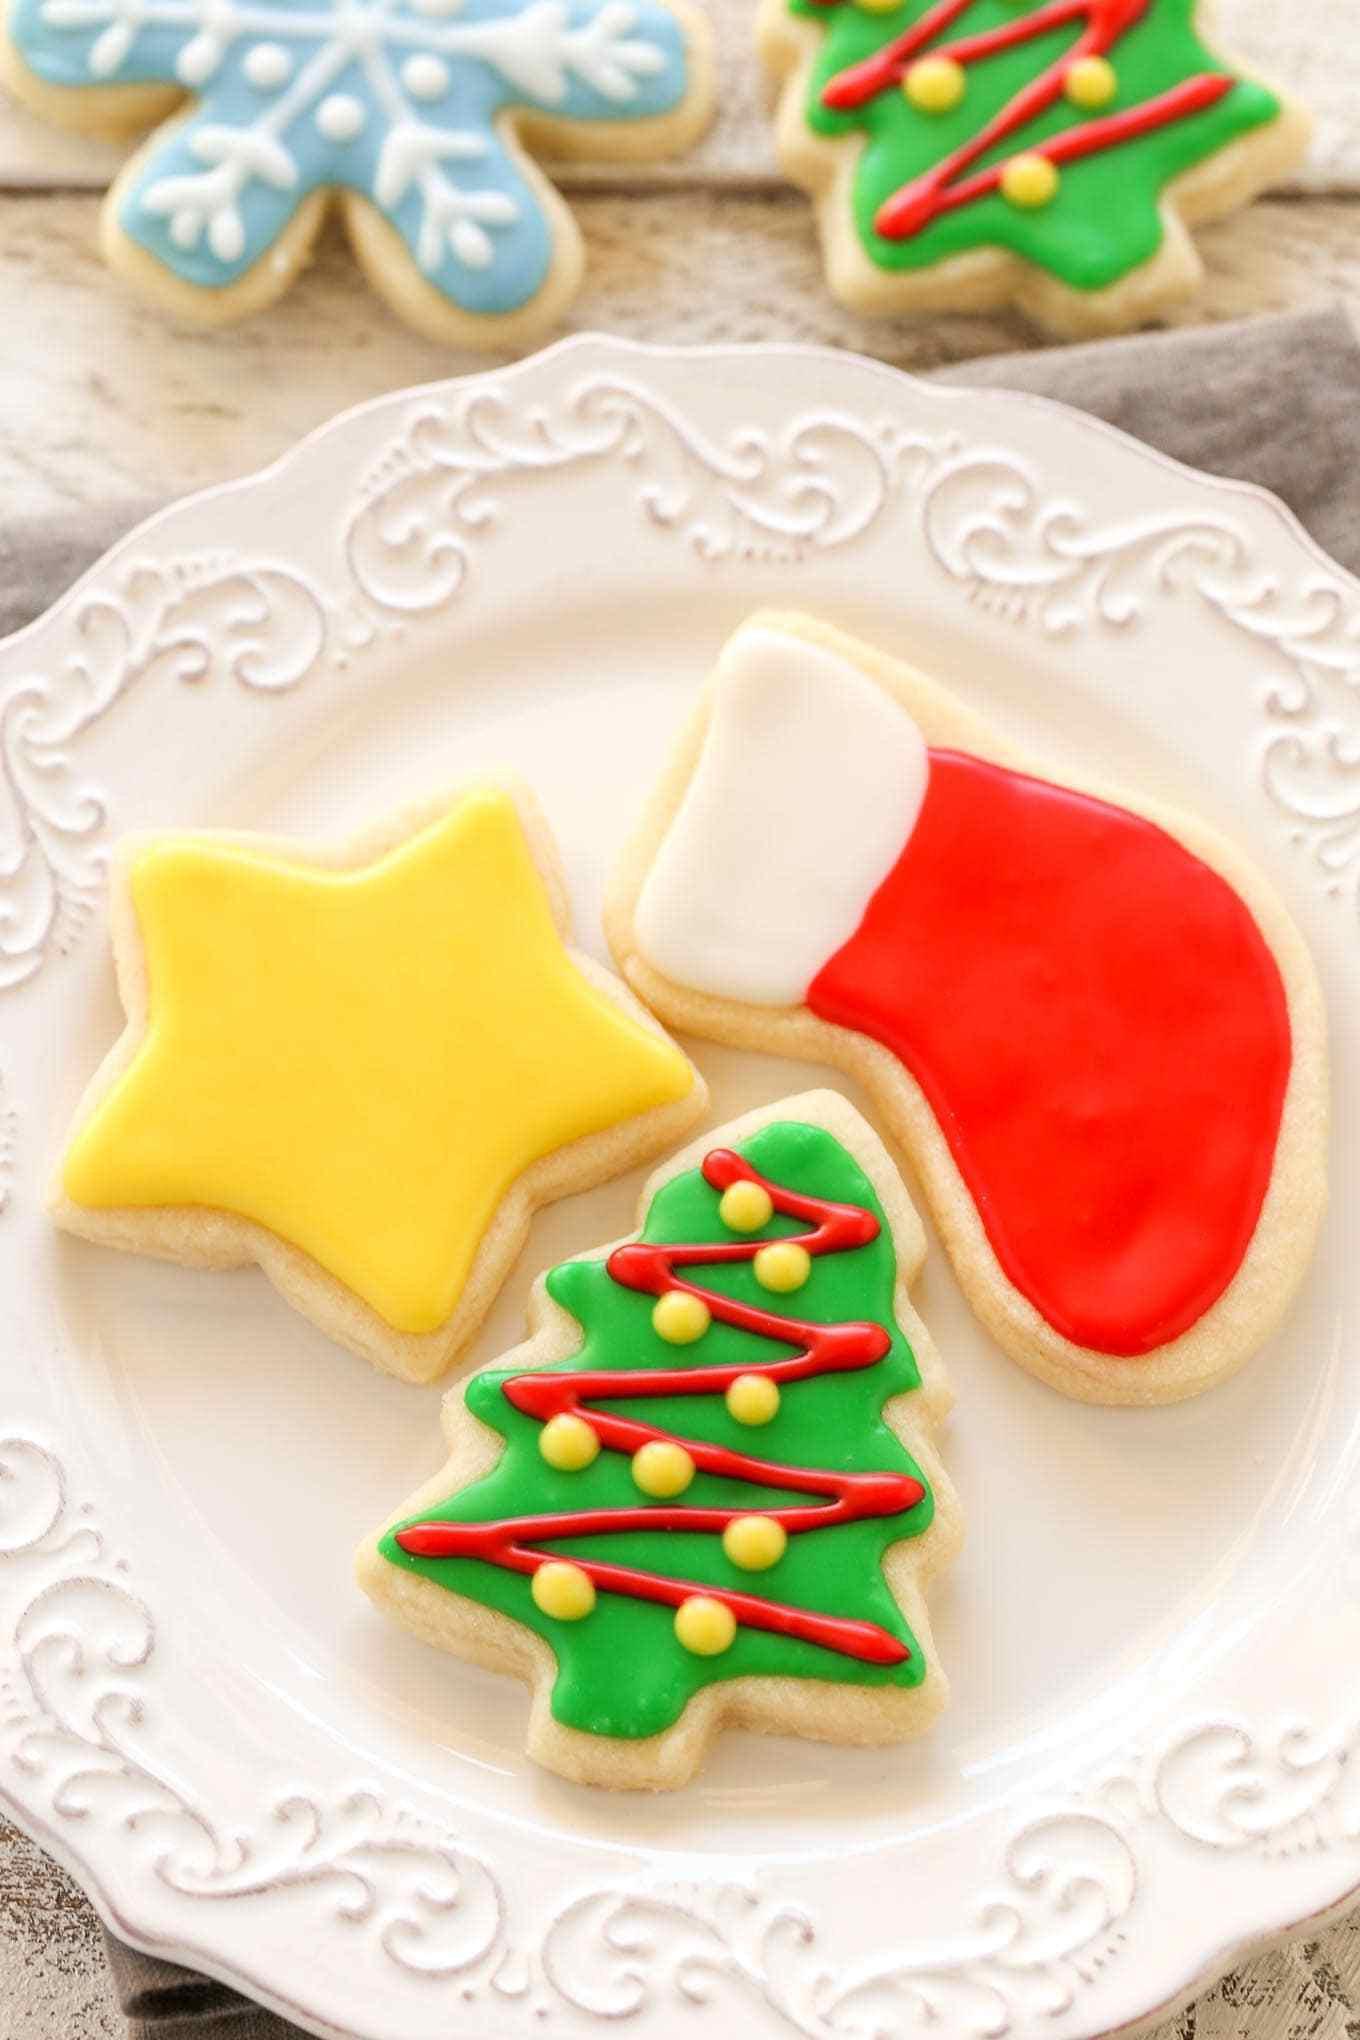 Christmas Sugar Cookies Recipe  Soft Christmas Cut Out Sugar Cookies Live Well Bake ten